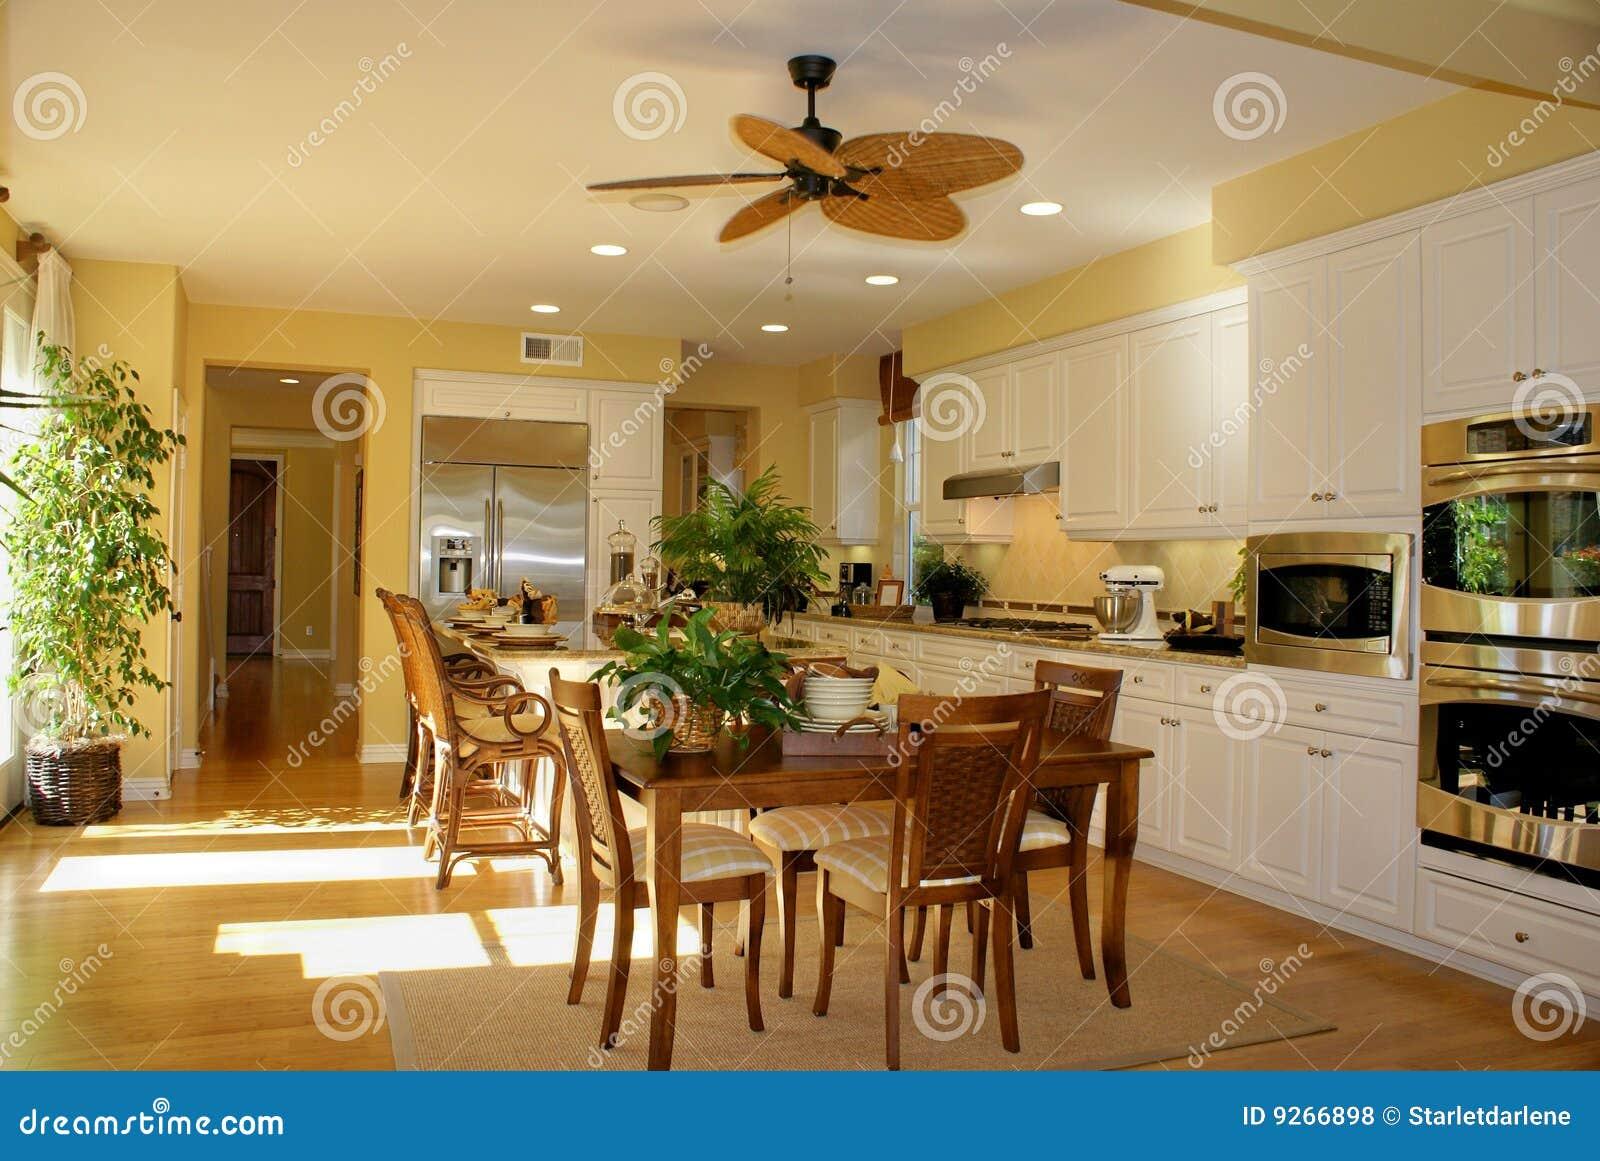 Kitchen Sunny Yellow Stock Photo Image Of Floors